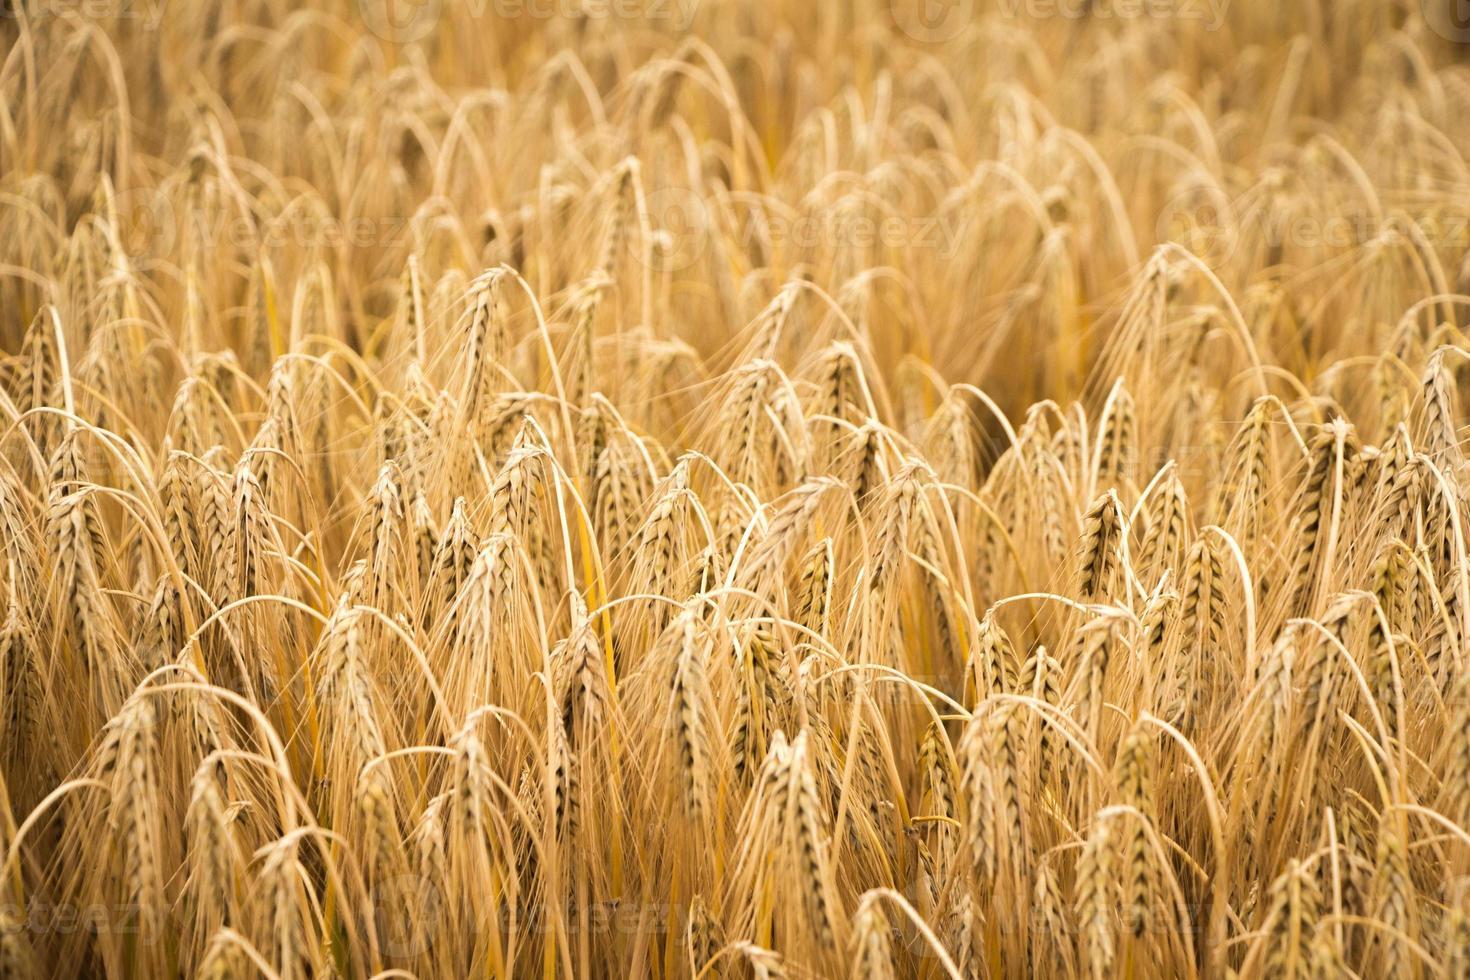 golden wheat field for harvest season photo